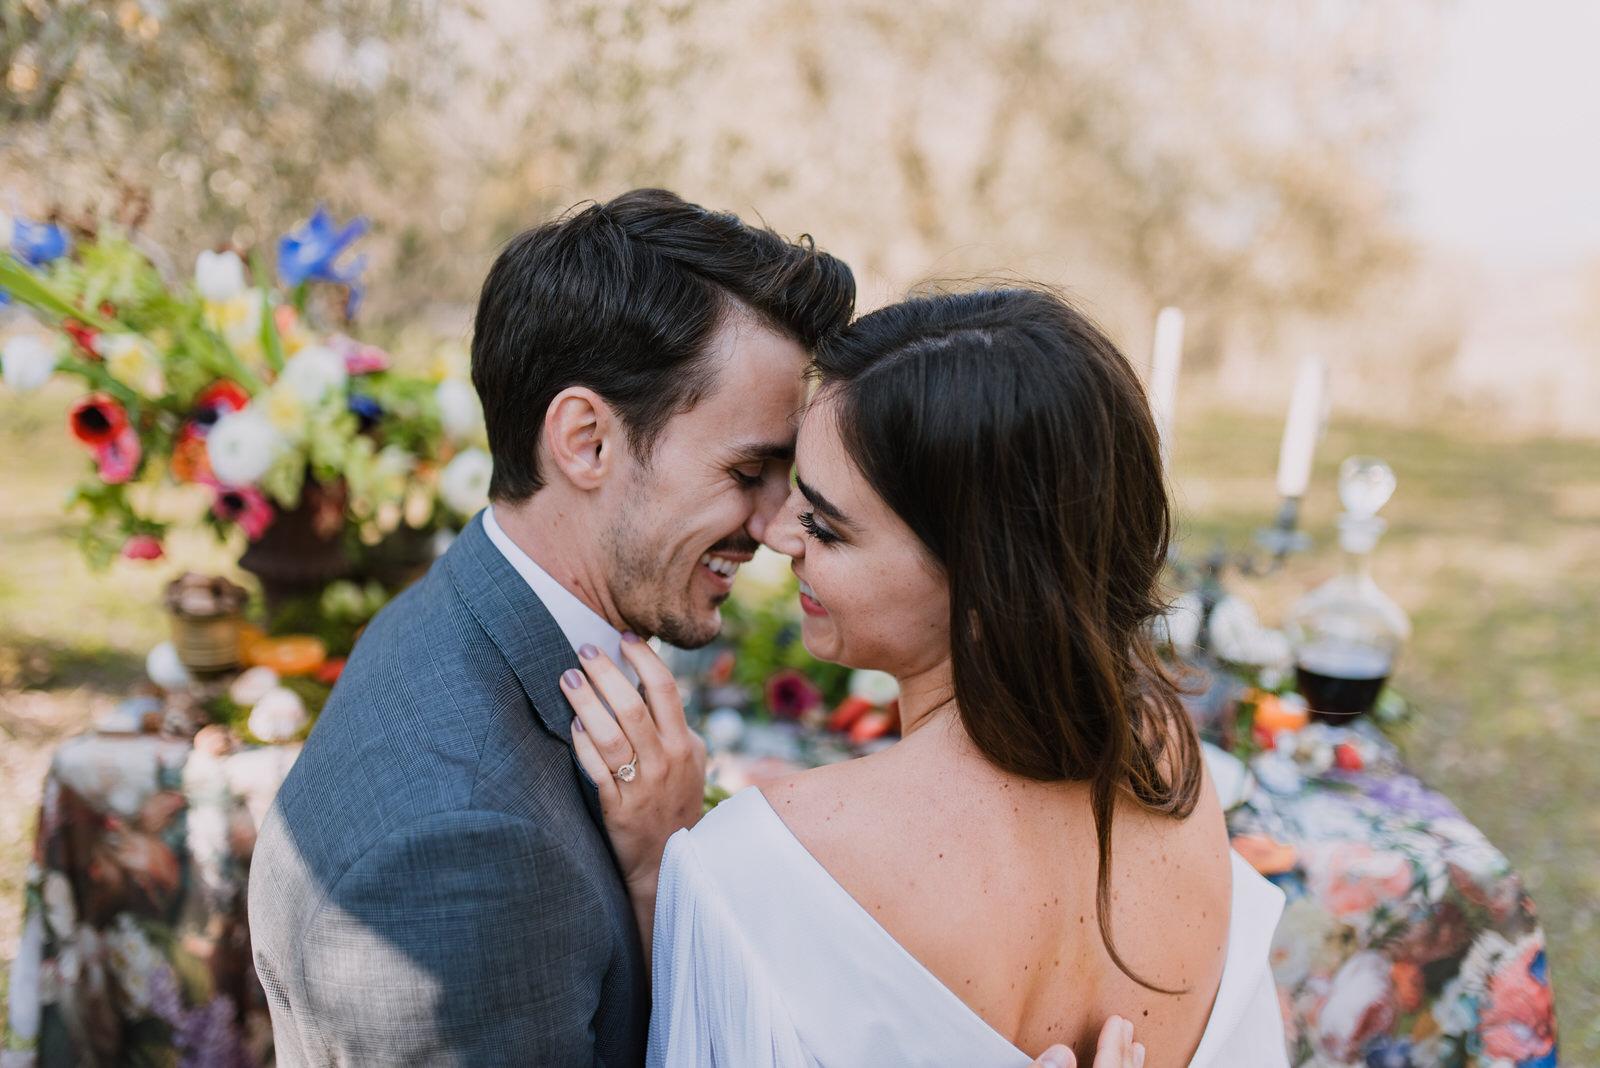 tuscany wedding photography 61.jpg